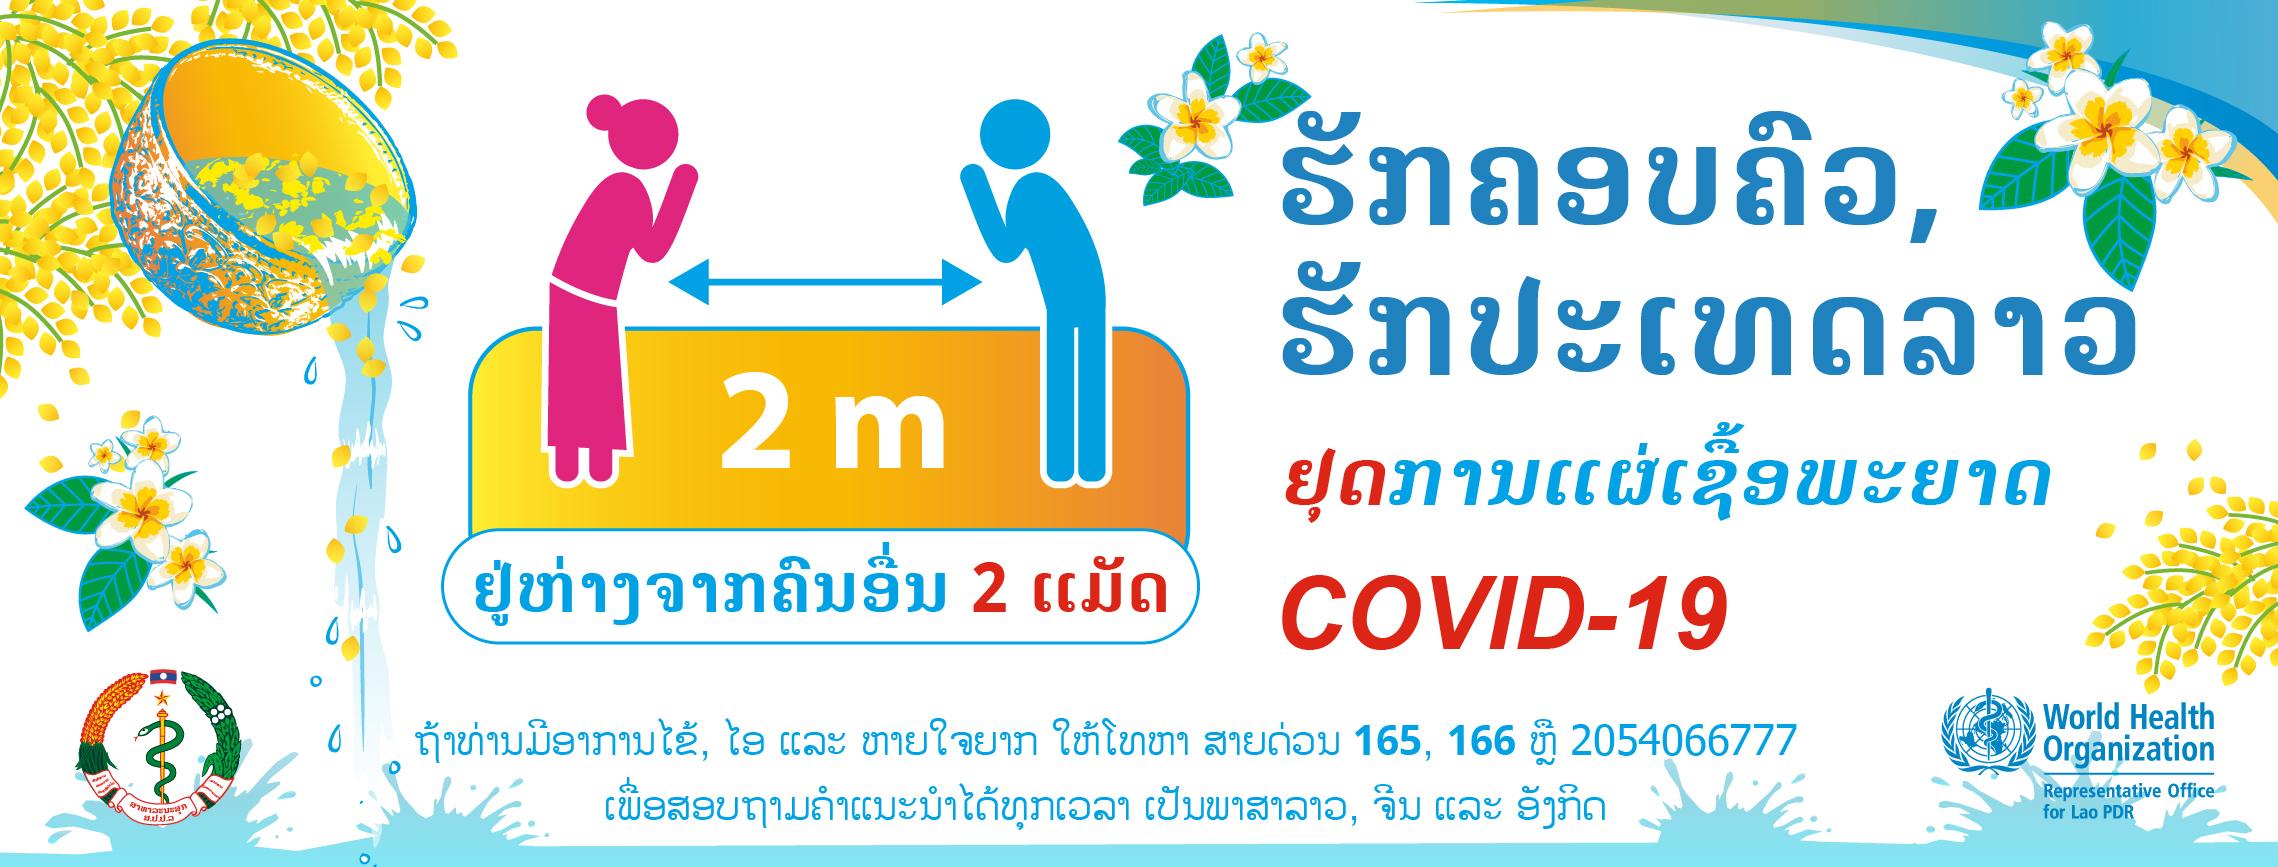 Cov_Banr_820x312px_Safe Pimai-Love you family love Laos_LAO_10apr2020